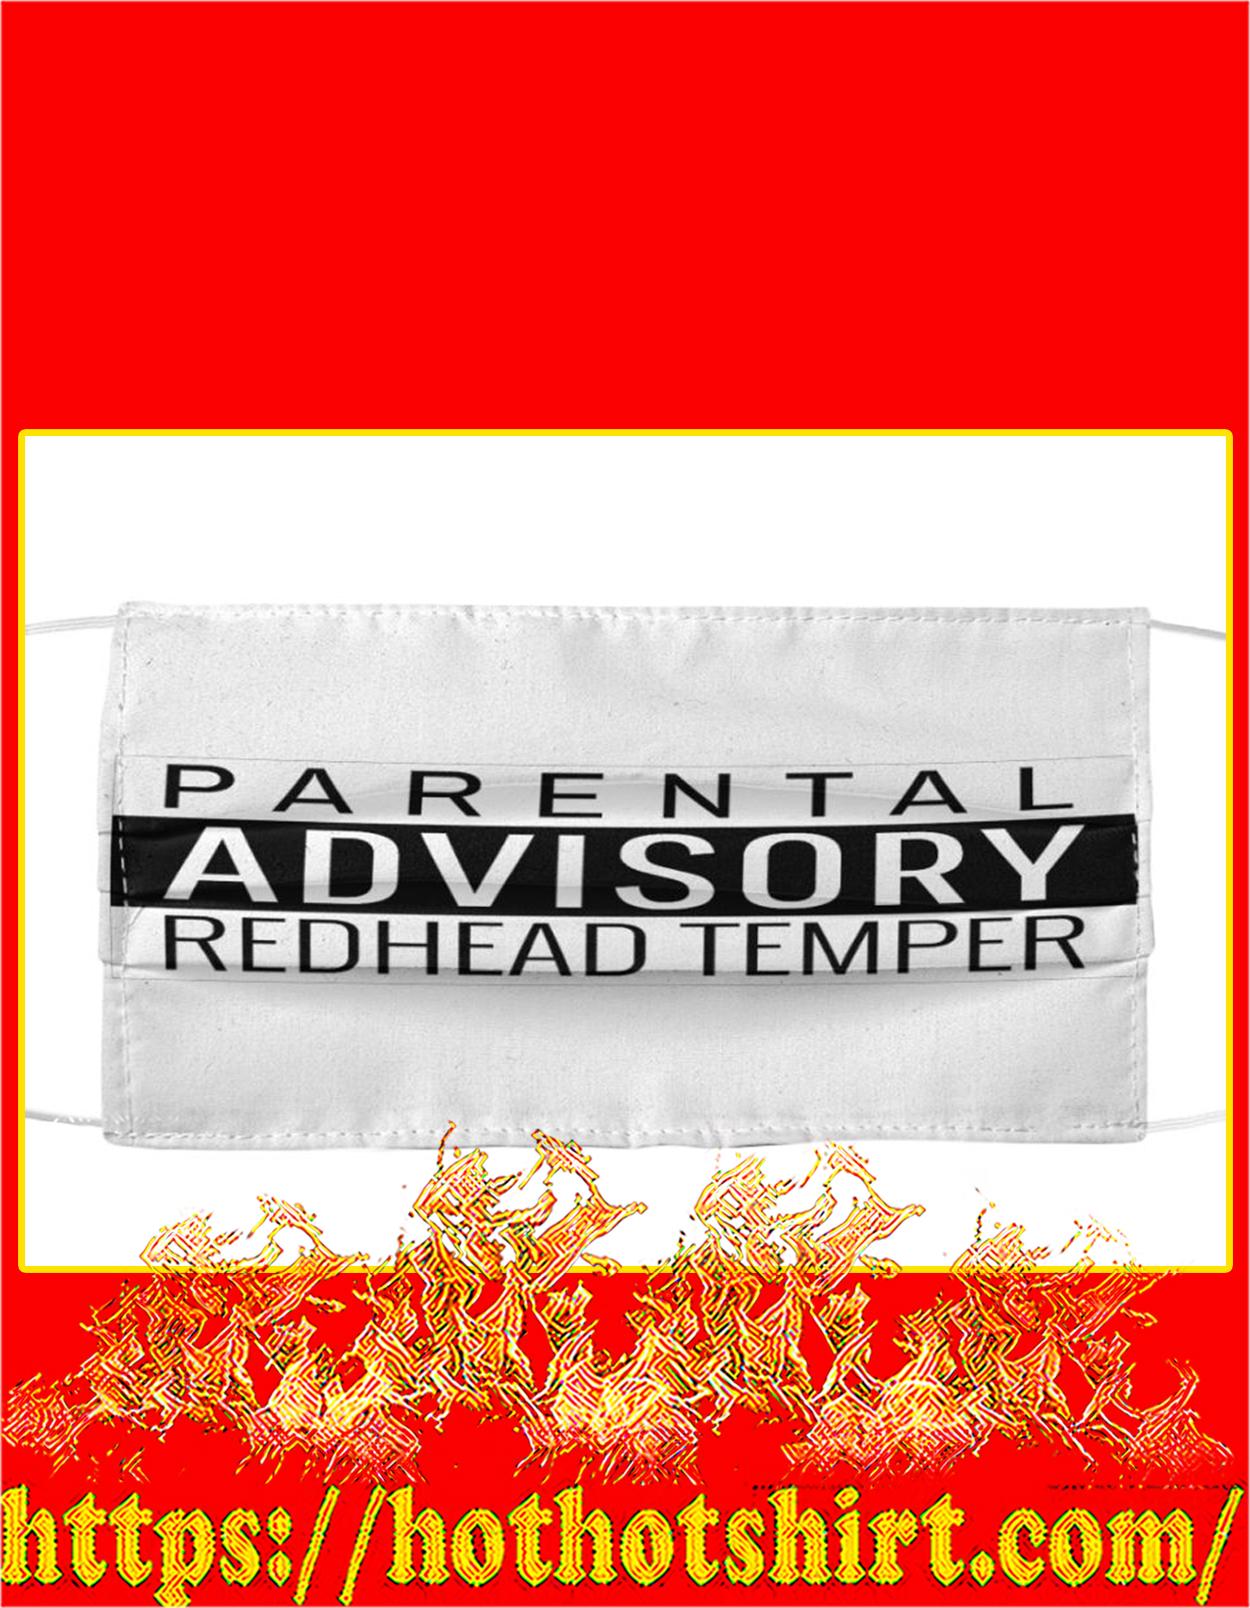 Parental advisory redhead temper face mask - detail